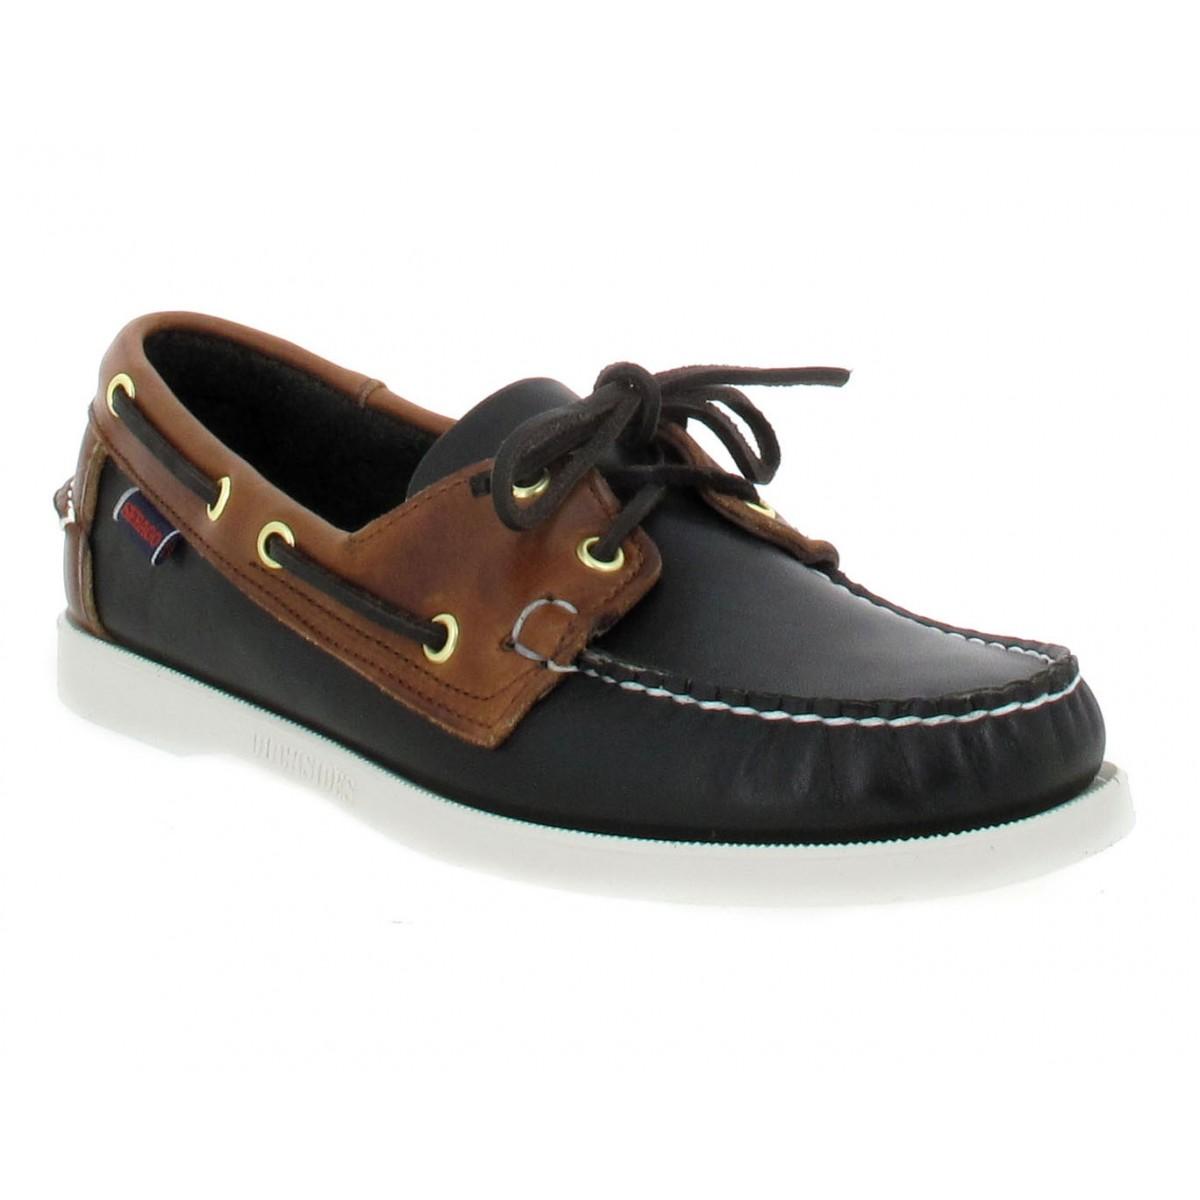 Chaussures bateaux SEBAGO Docksides Spinnaker cuir Homme Noir + Marron